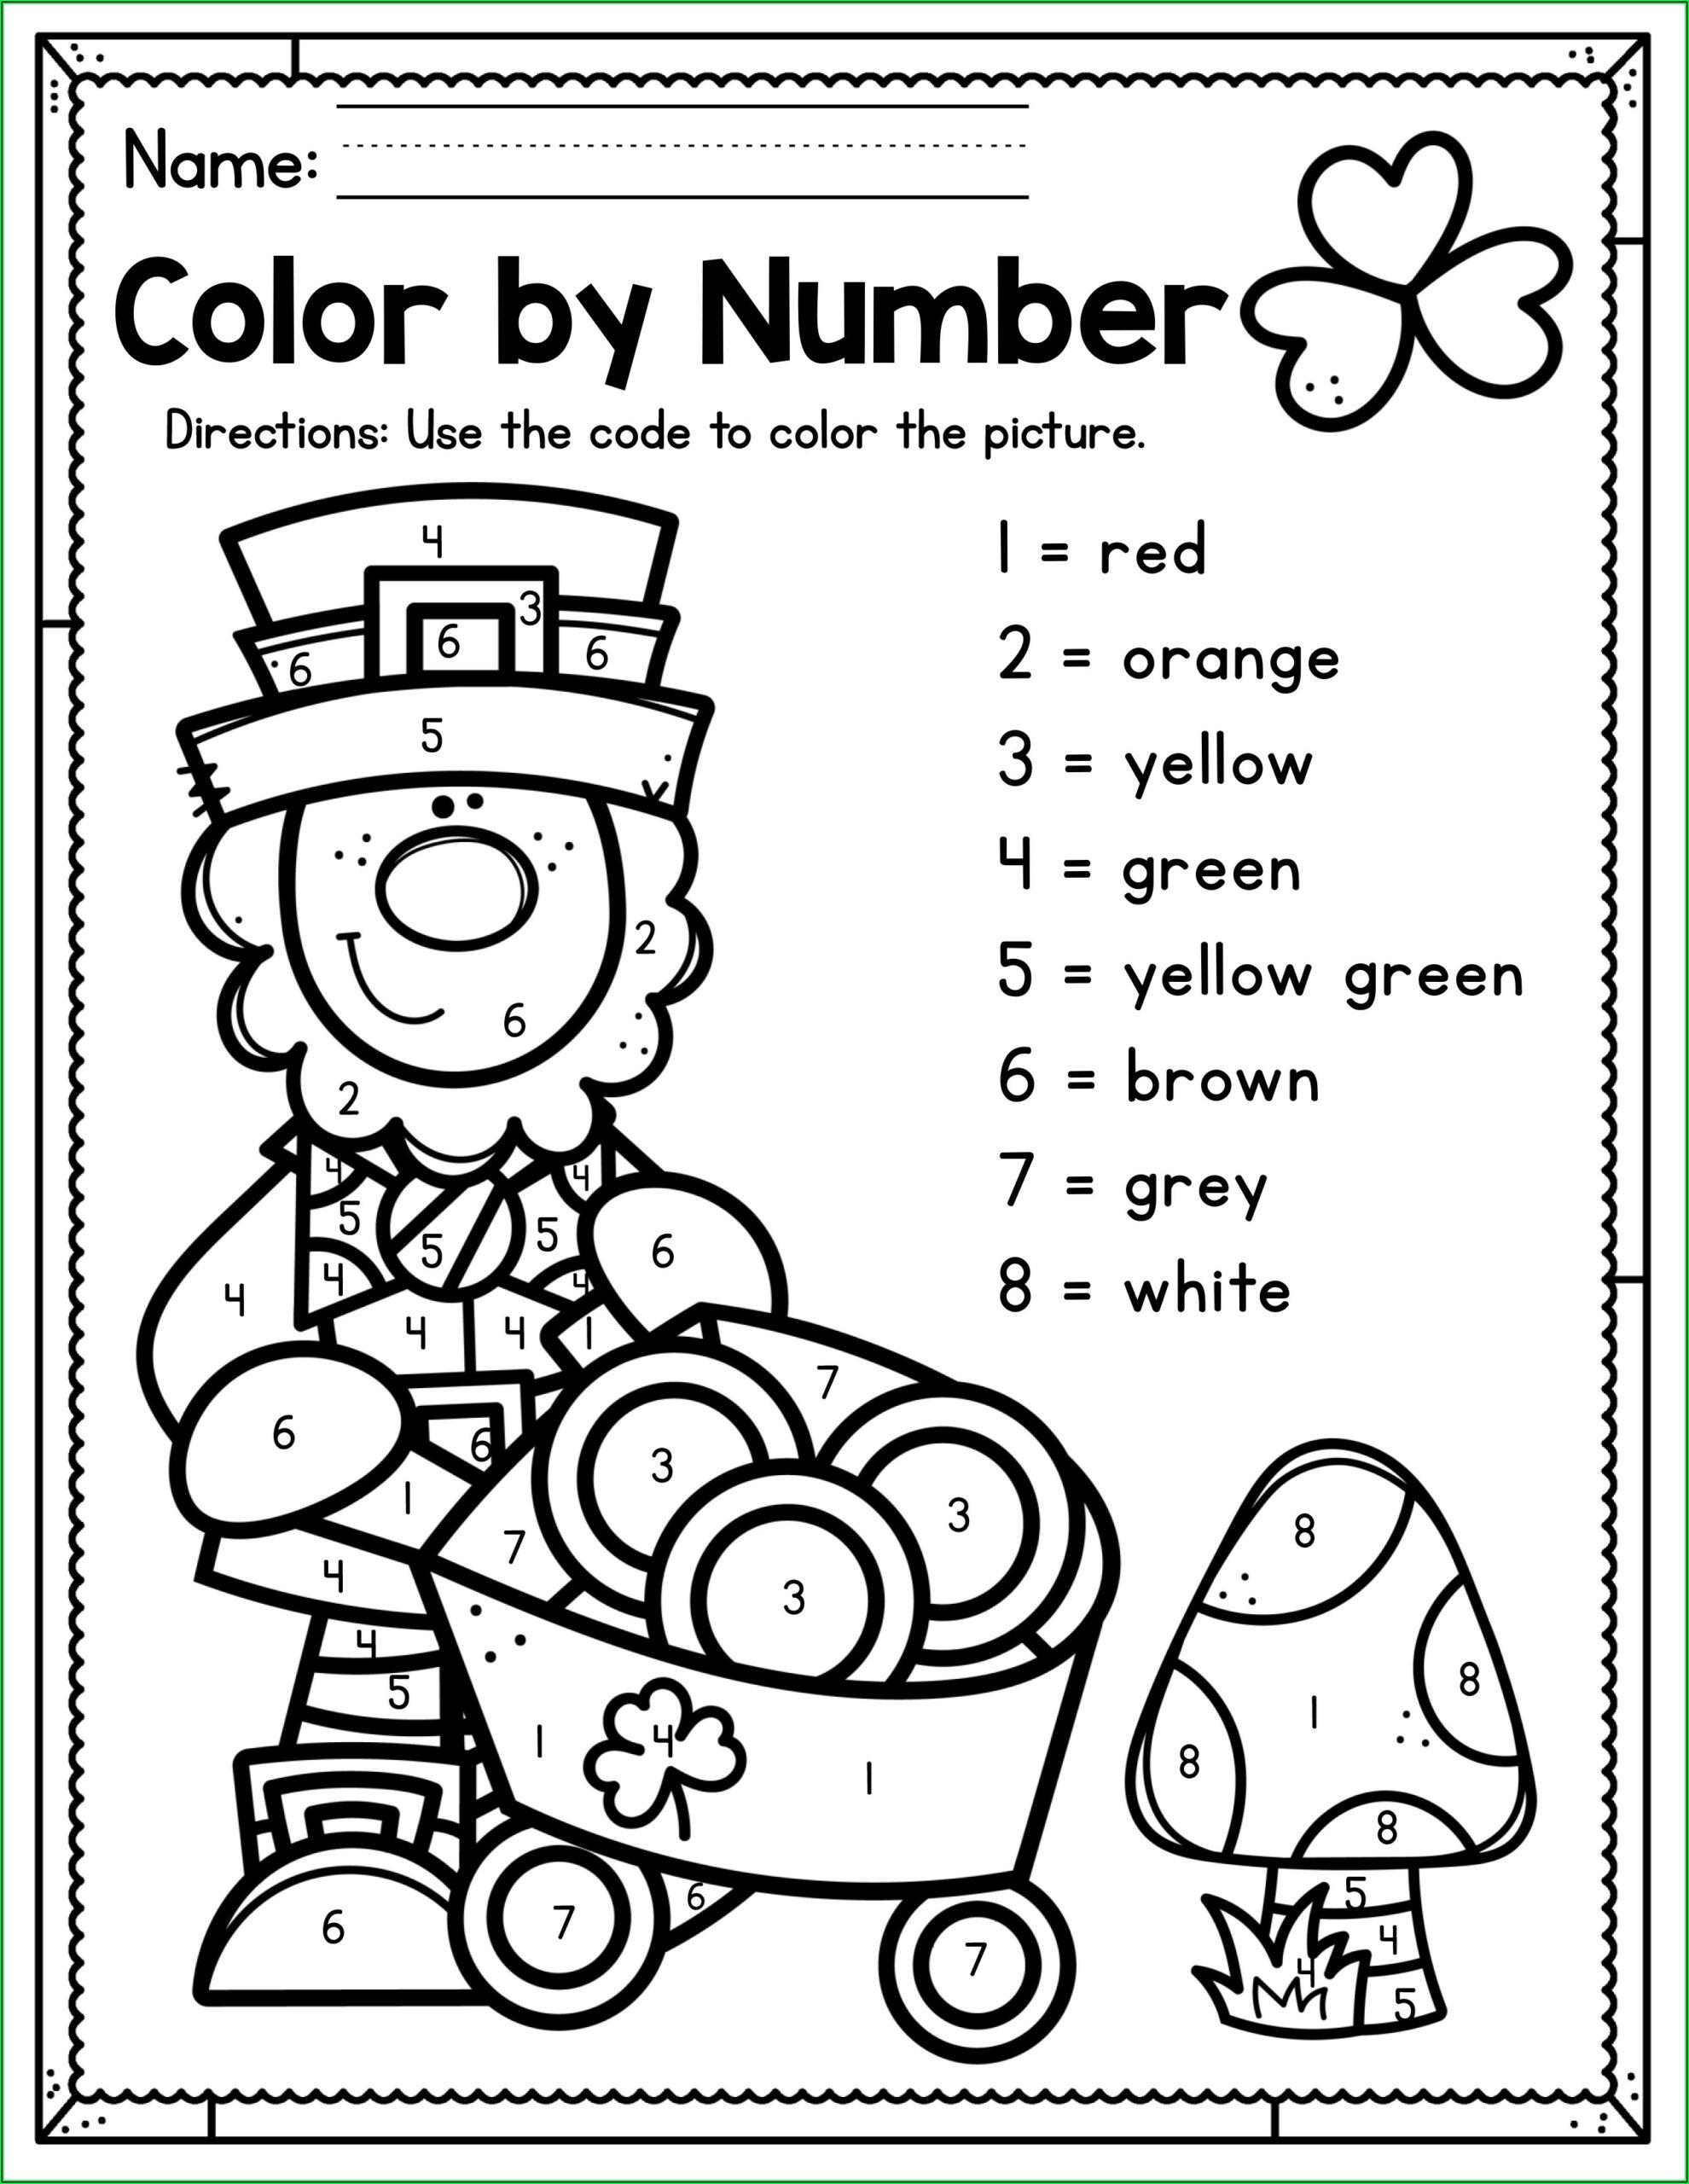 St Patrick's Day Preschool Worksheets